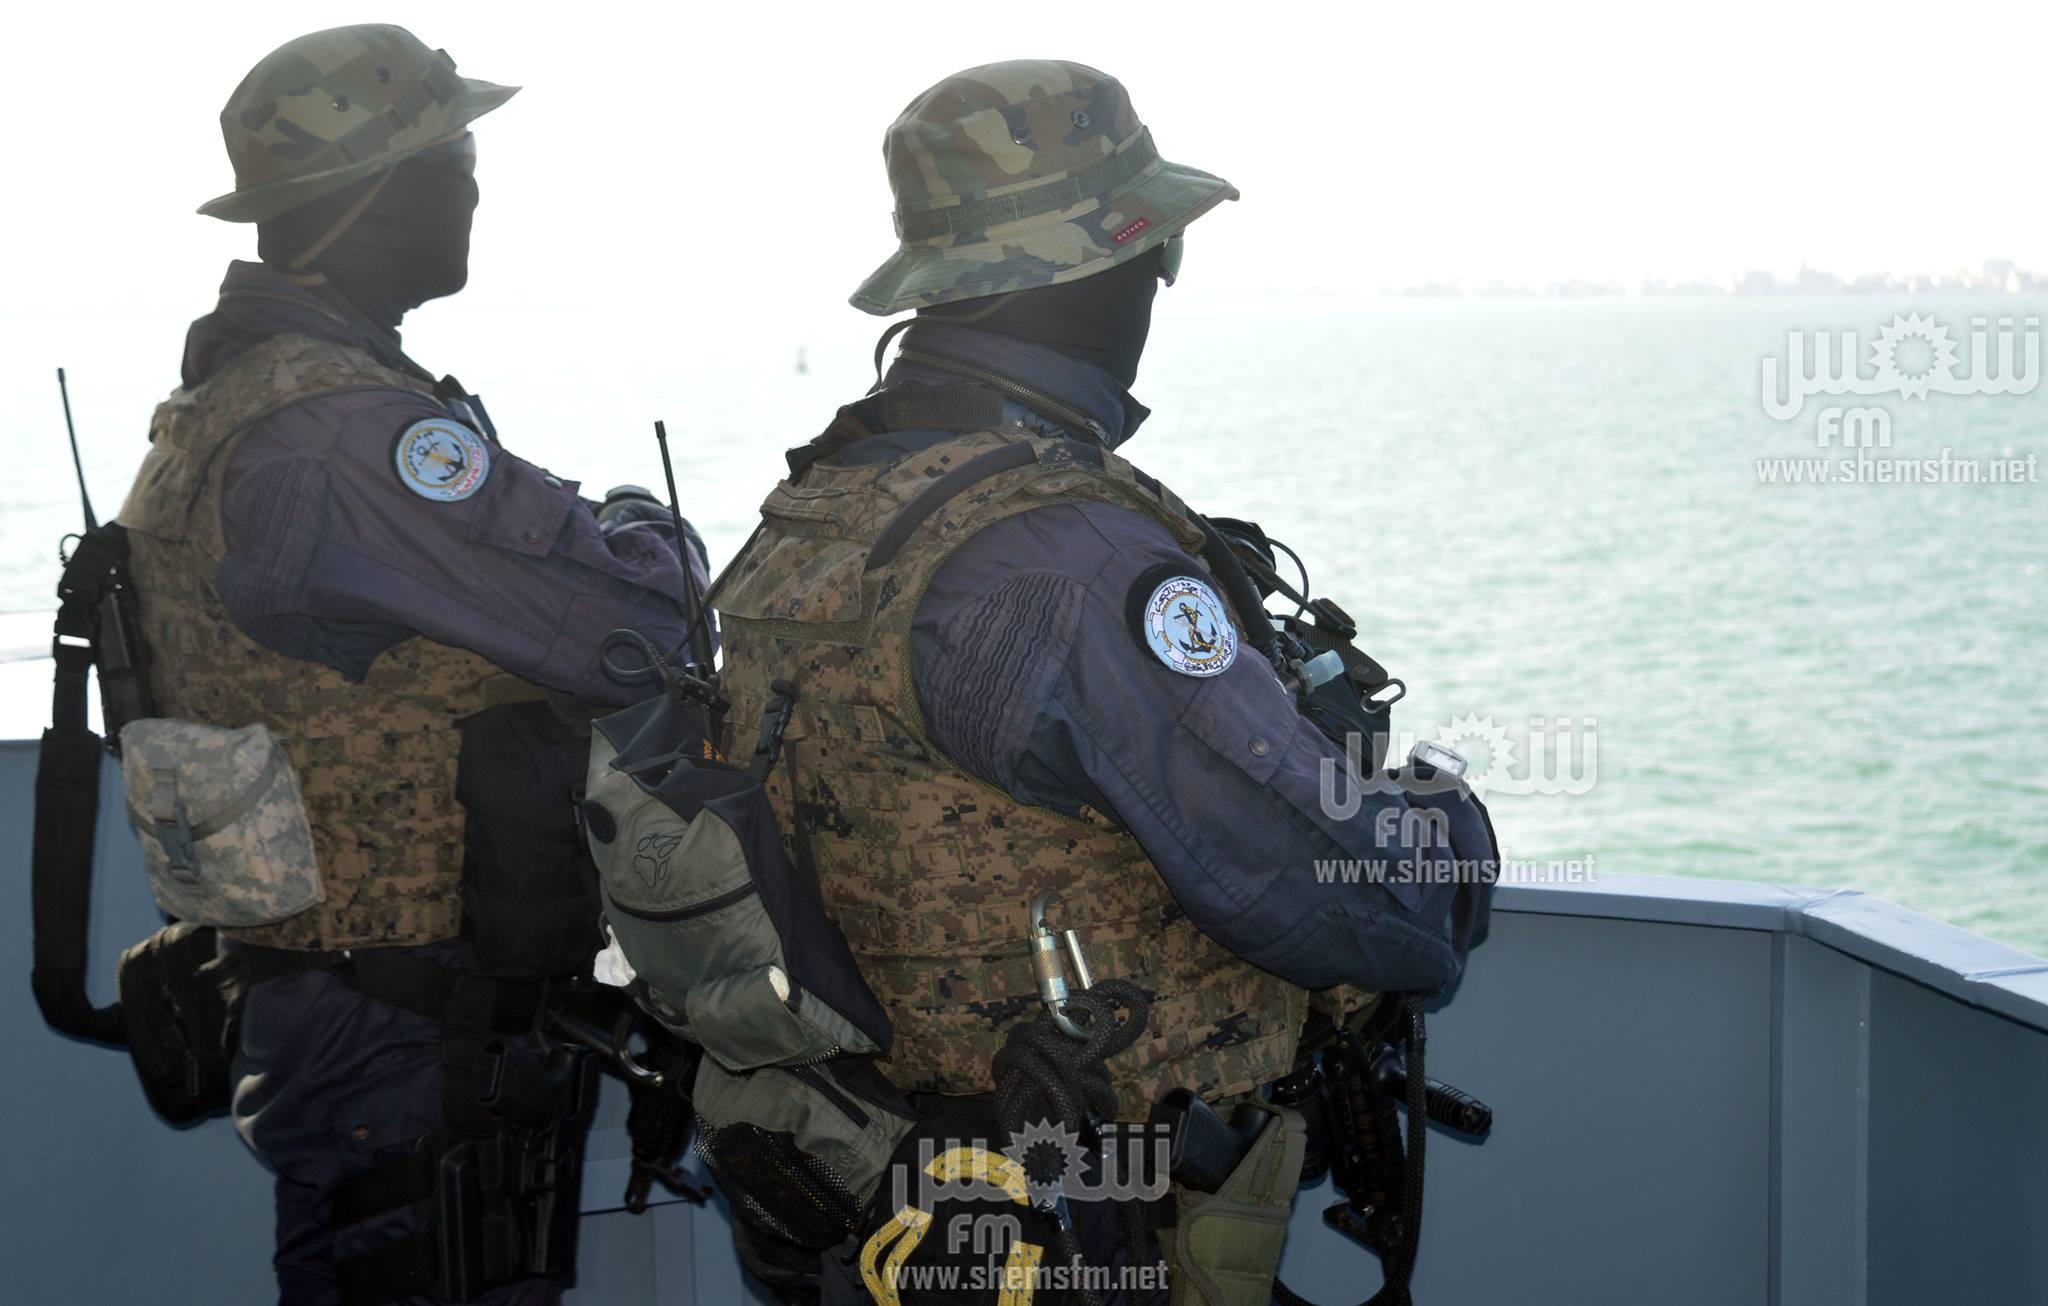 Armée Tunisienne / Tunisian Armed Forces / القوات المسلحة التونسية - Page 16 57198755-2455594874461783-6454789534637883392-o